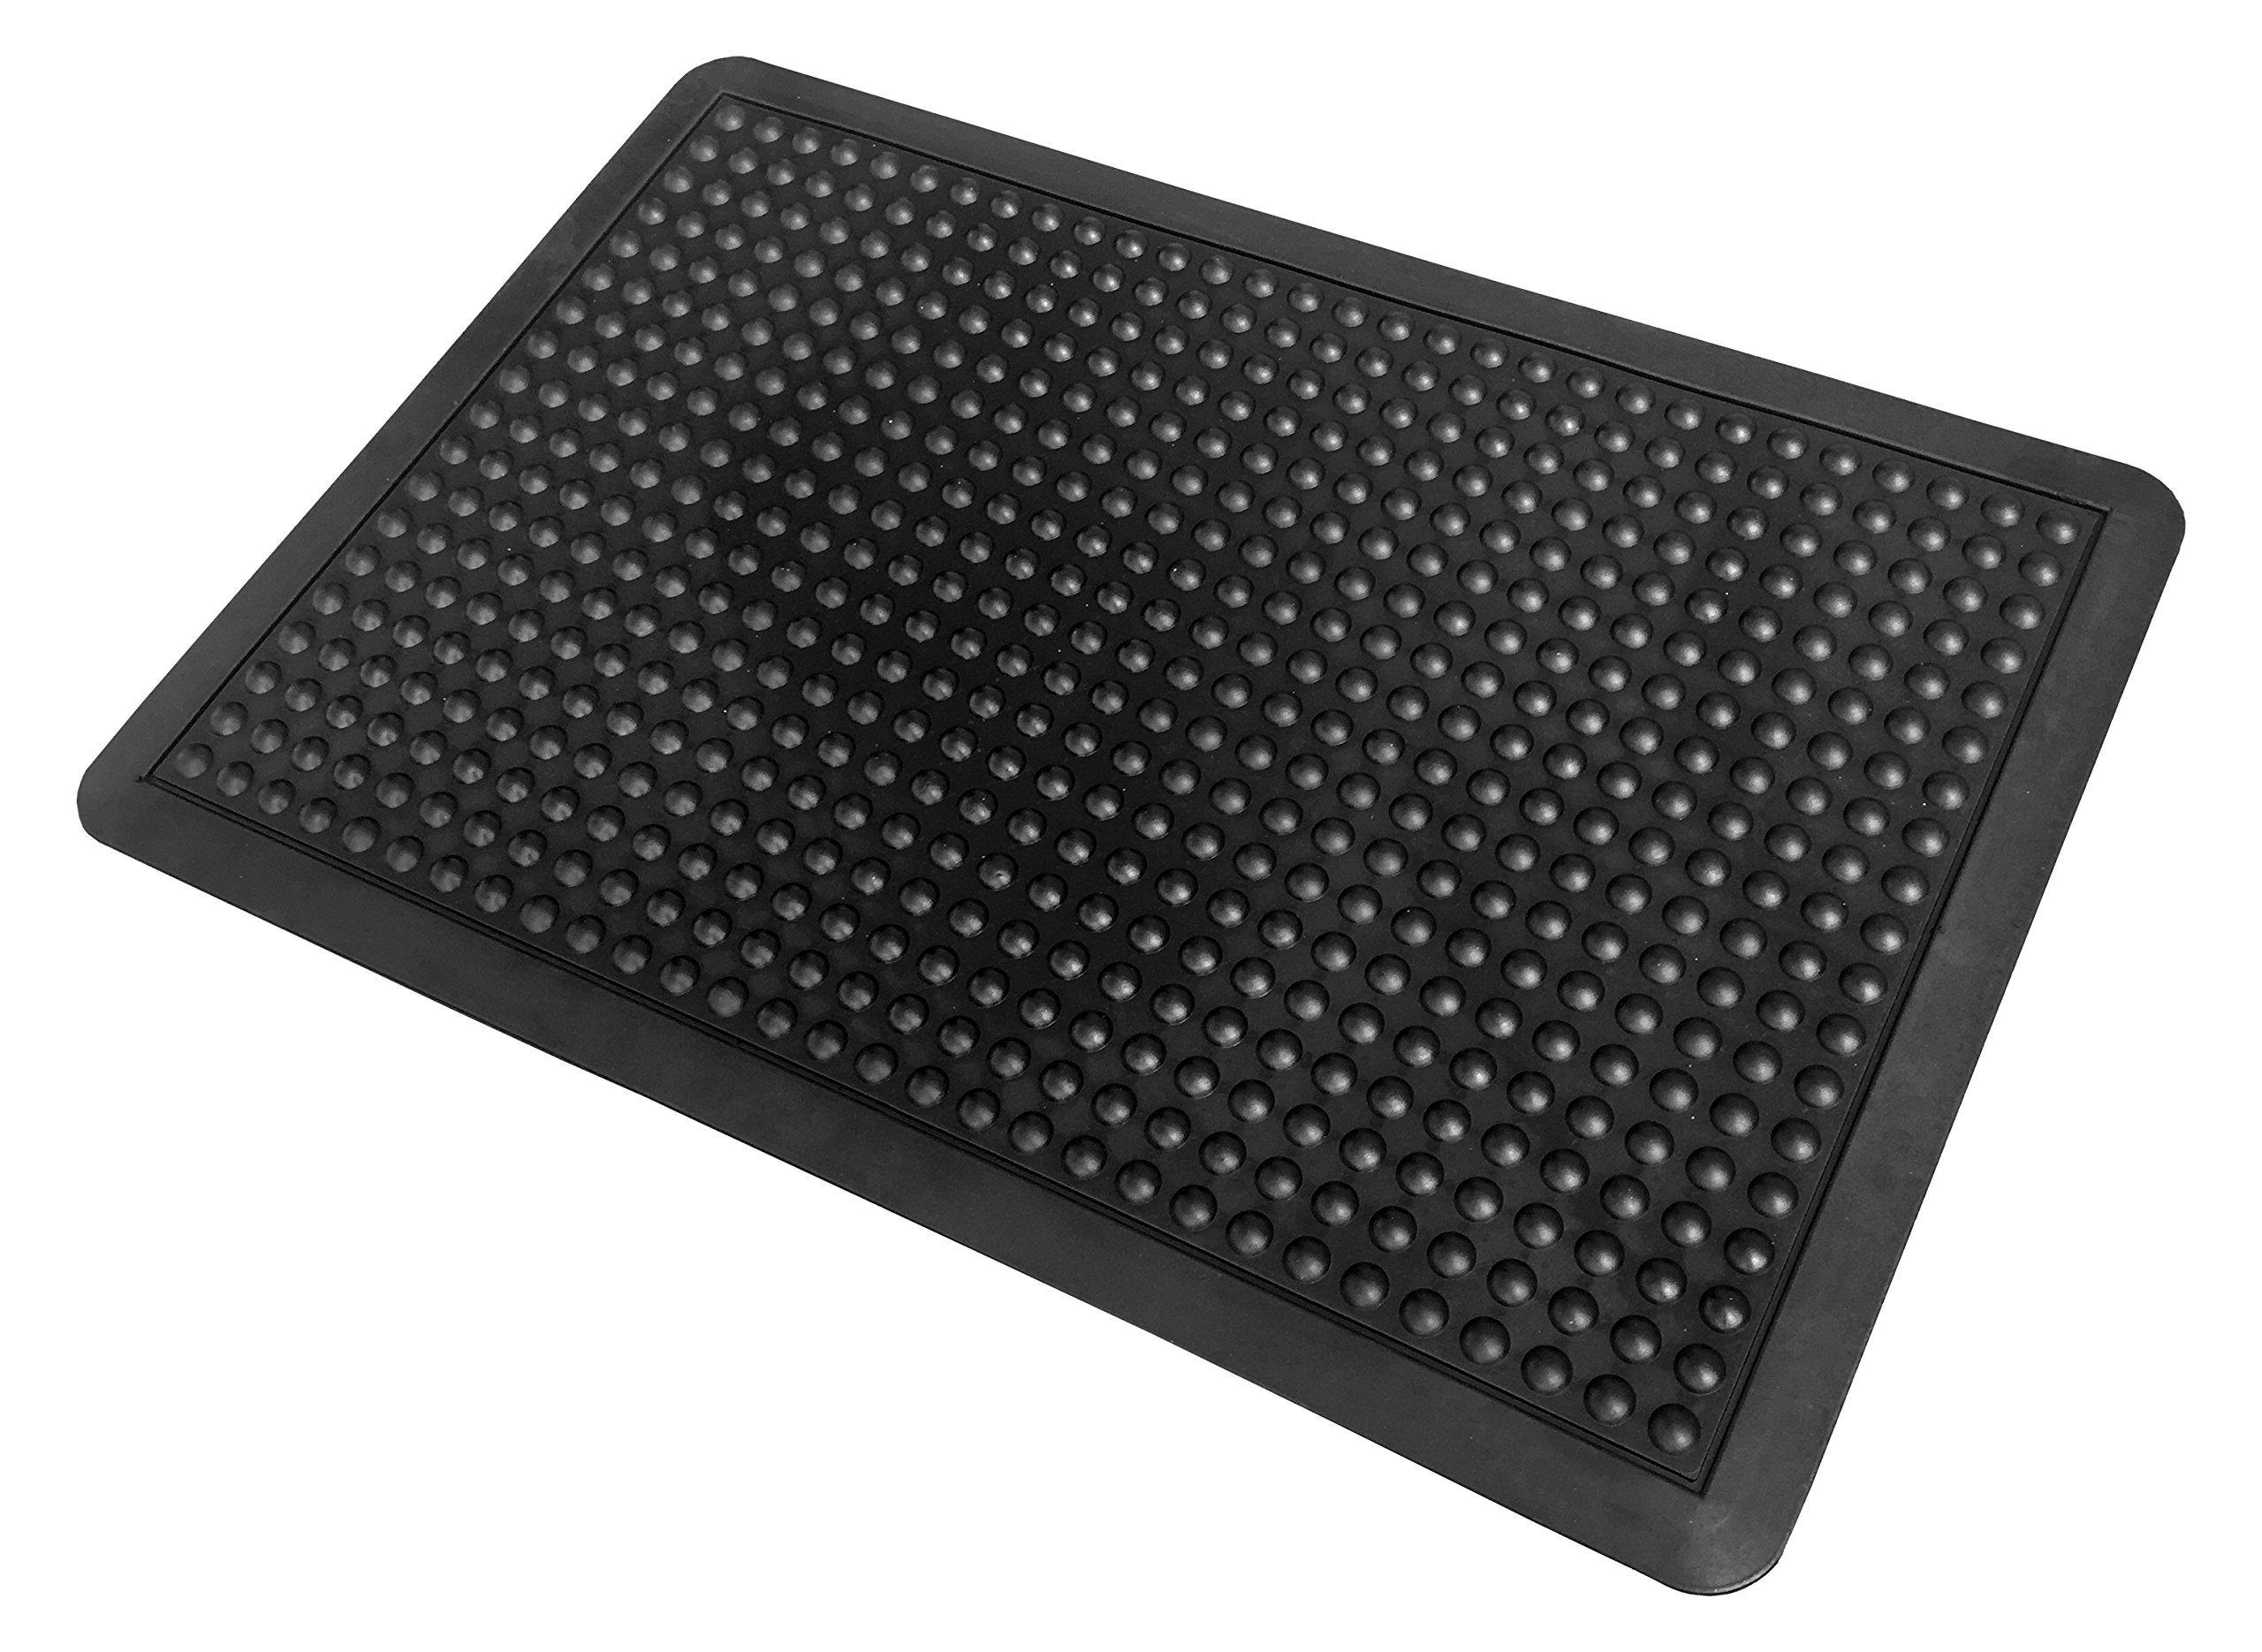 Bubble Mat 1/2'' Rubber Anti-Fatigue Matting, 3' x 4', Solid Black